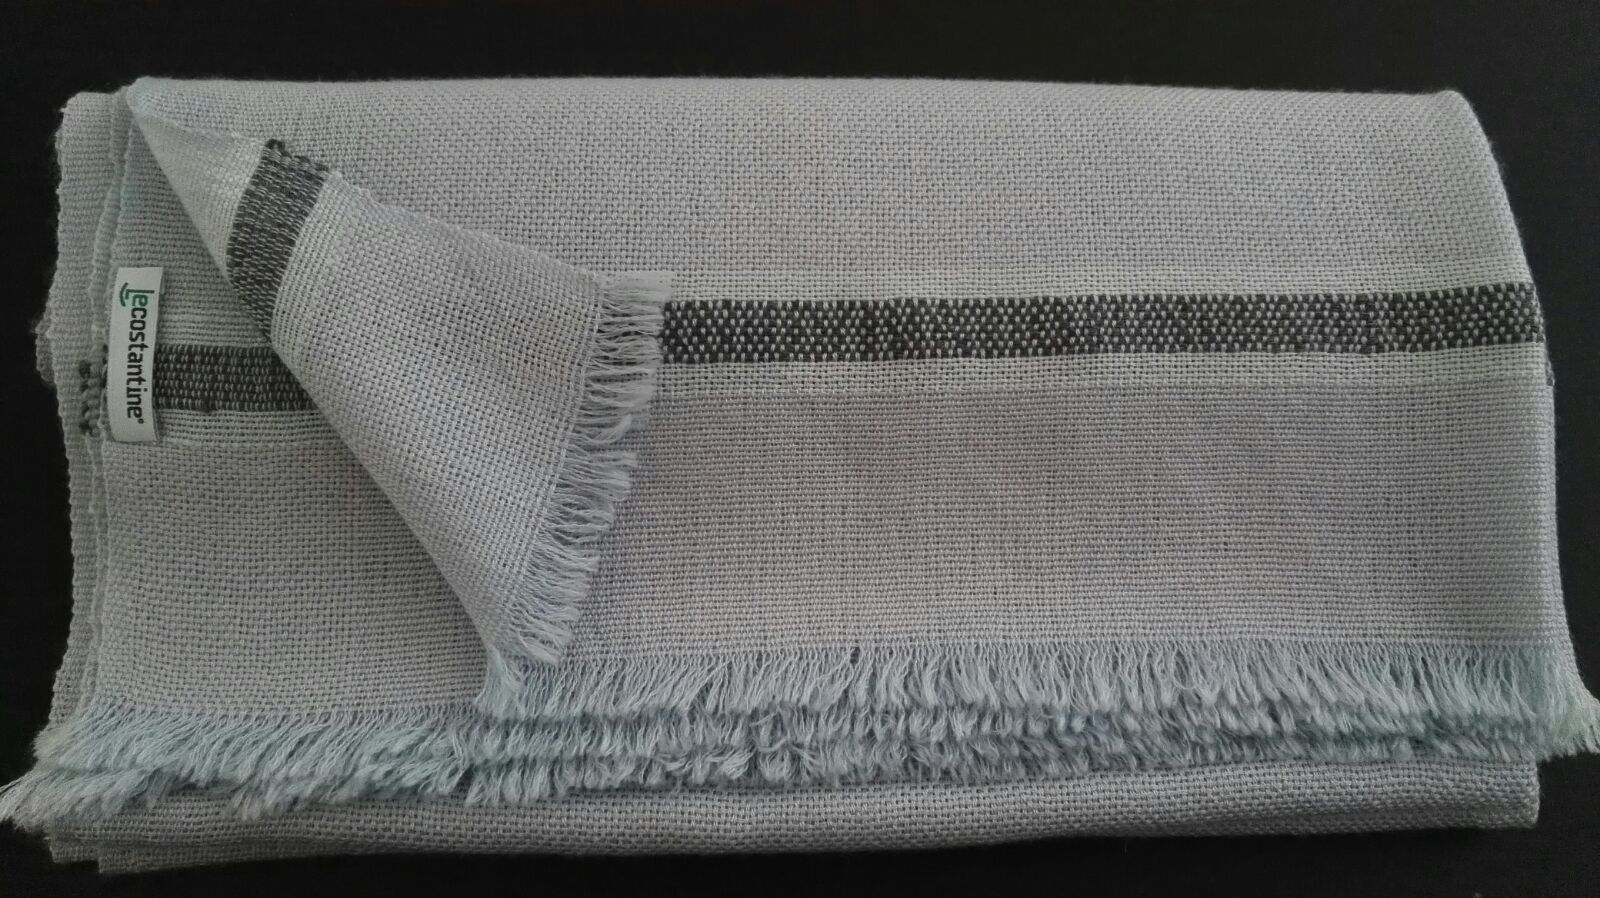 Le Costantine Tessitura Sciarpa da donna in cachemire grigia 2.jpeg. Sciarpa  da donna in cachemire e seta - cod. c8b5d530821